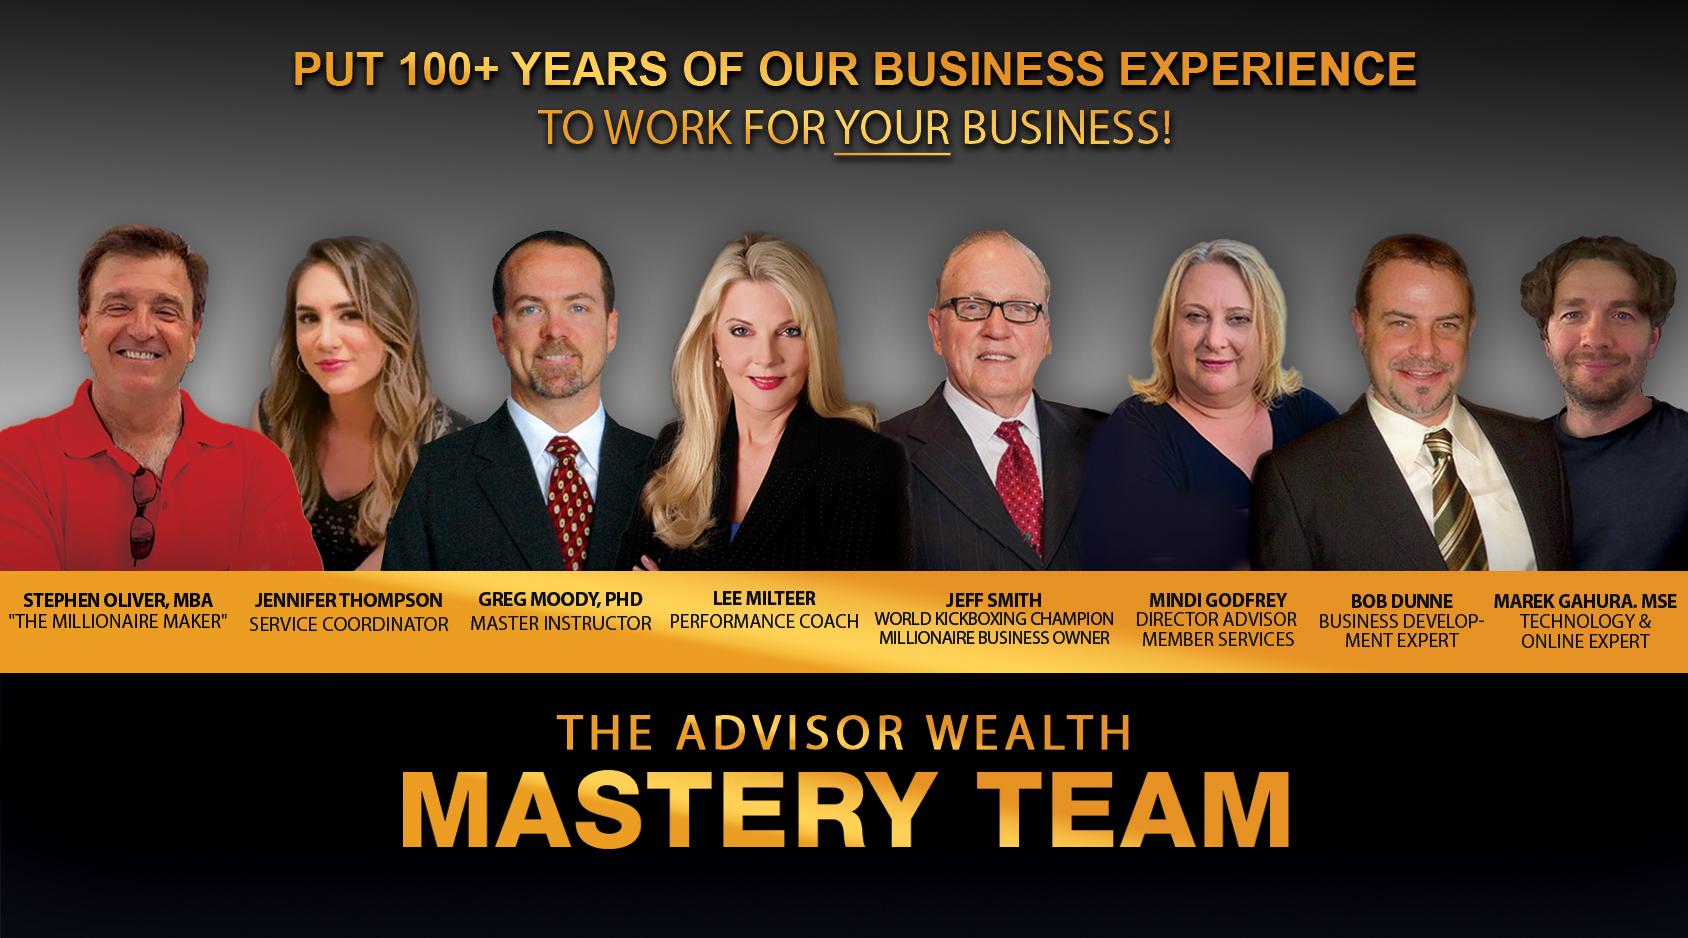 Mastery Team